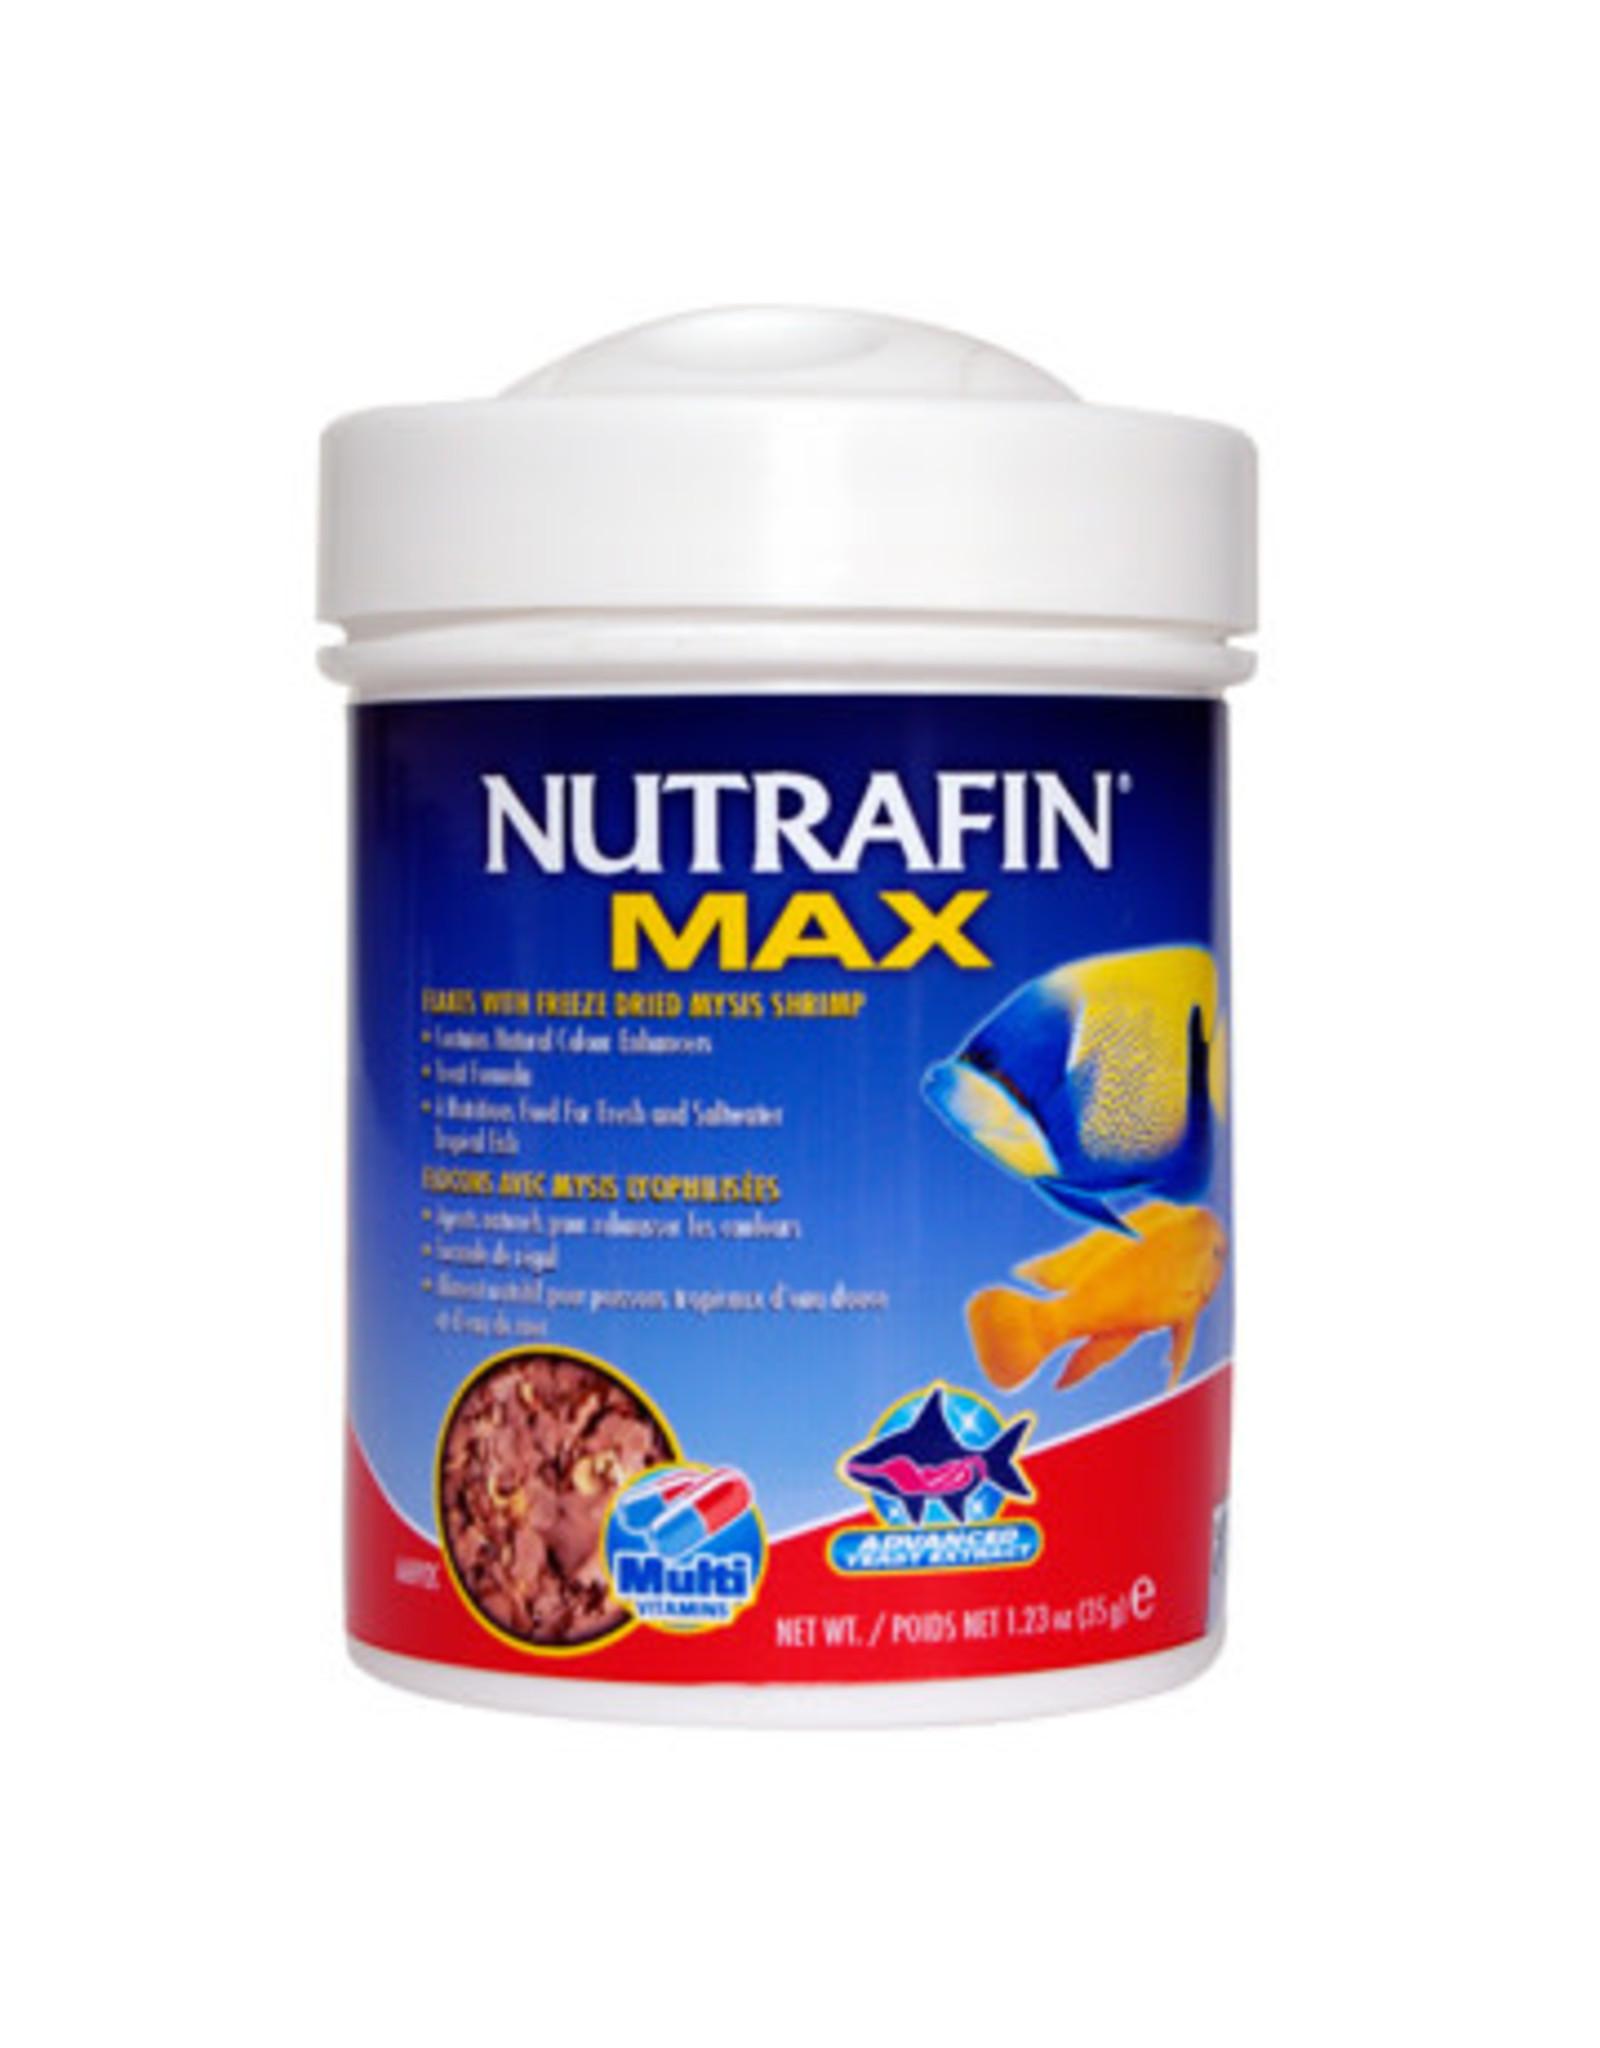 Nutrafin Nutrafin Max Flakes + Freeze Dried Mysis Shrimp 35 g (1.23 oz)